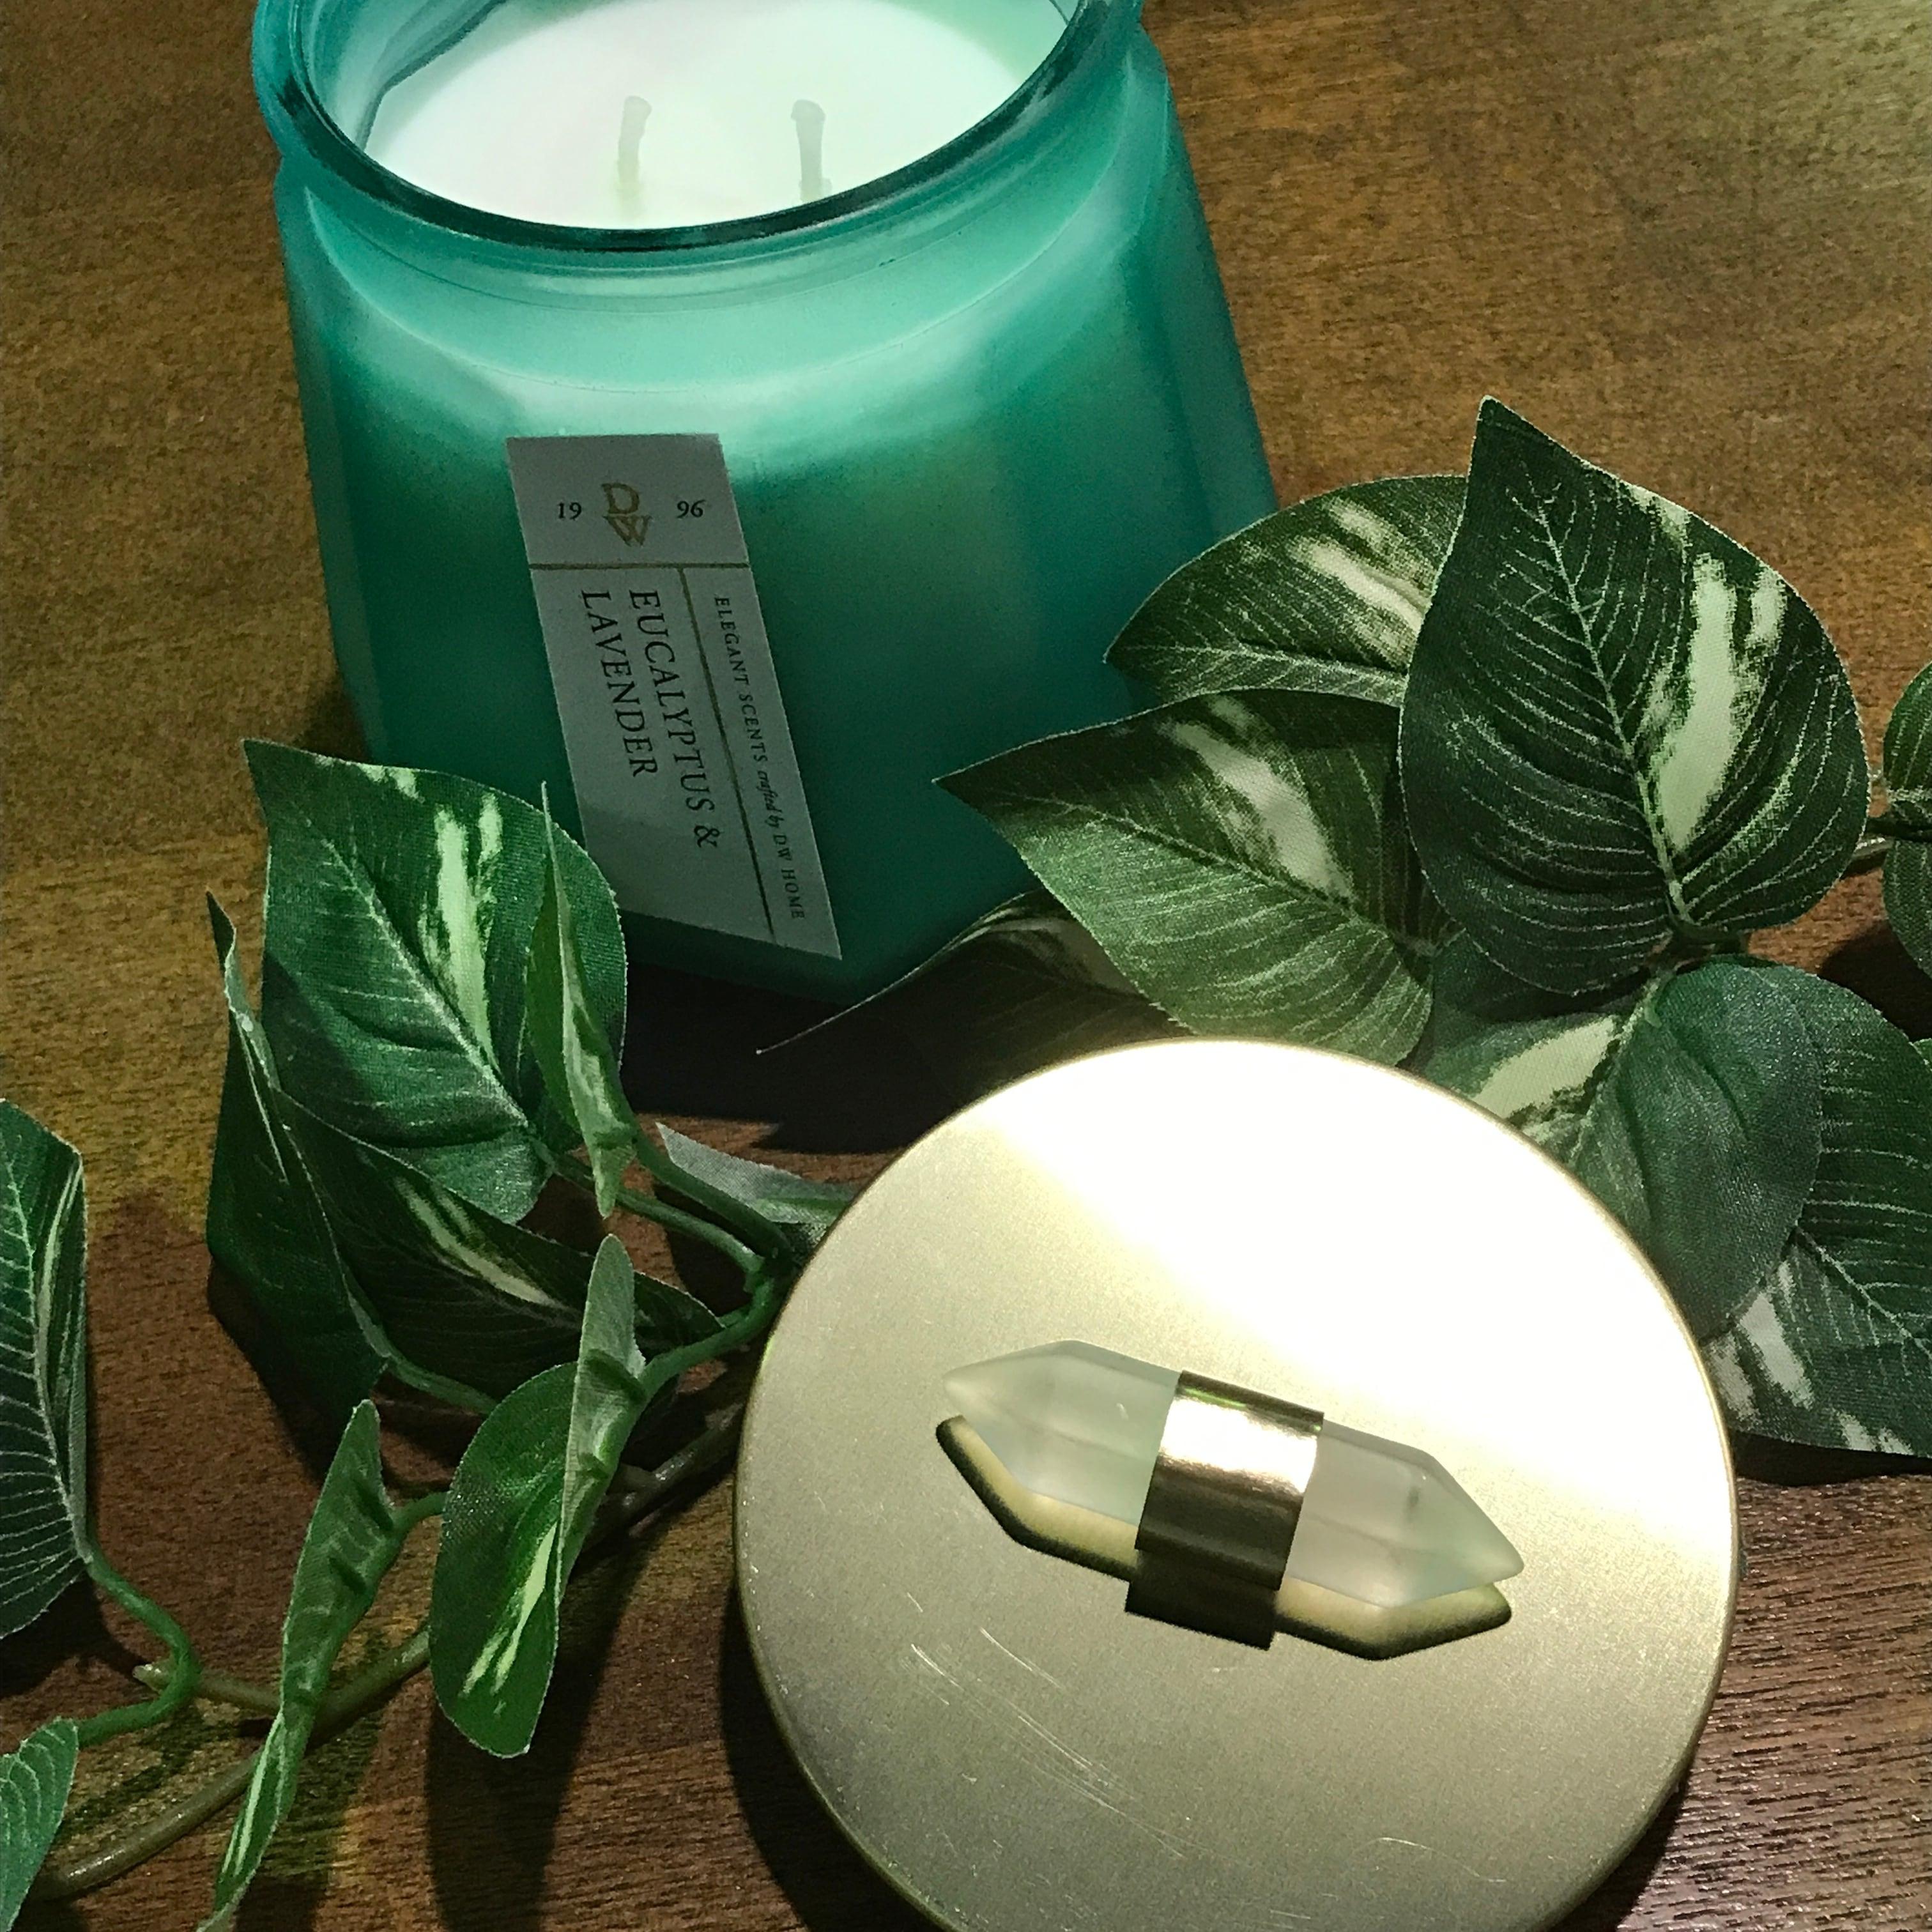 【DW Home Candles】EUCALYPTUS & LAVENDER【アロマキャンドル】